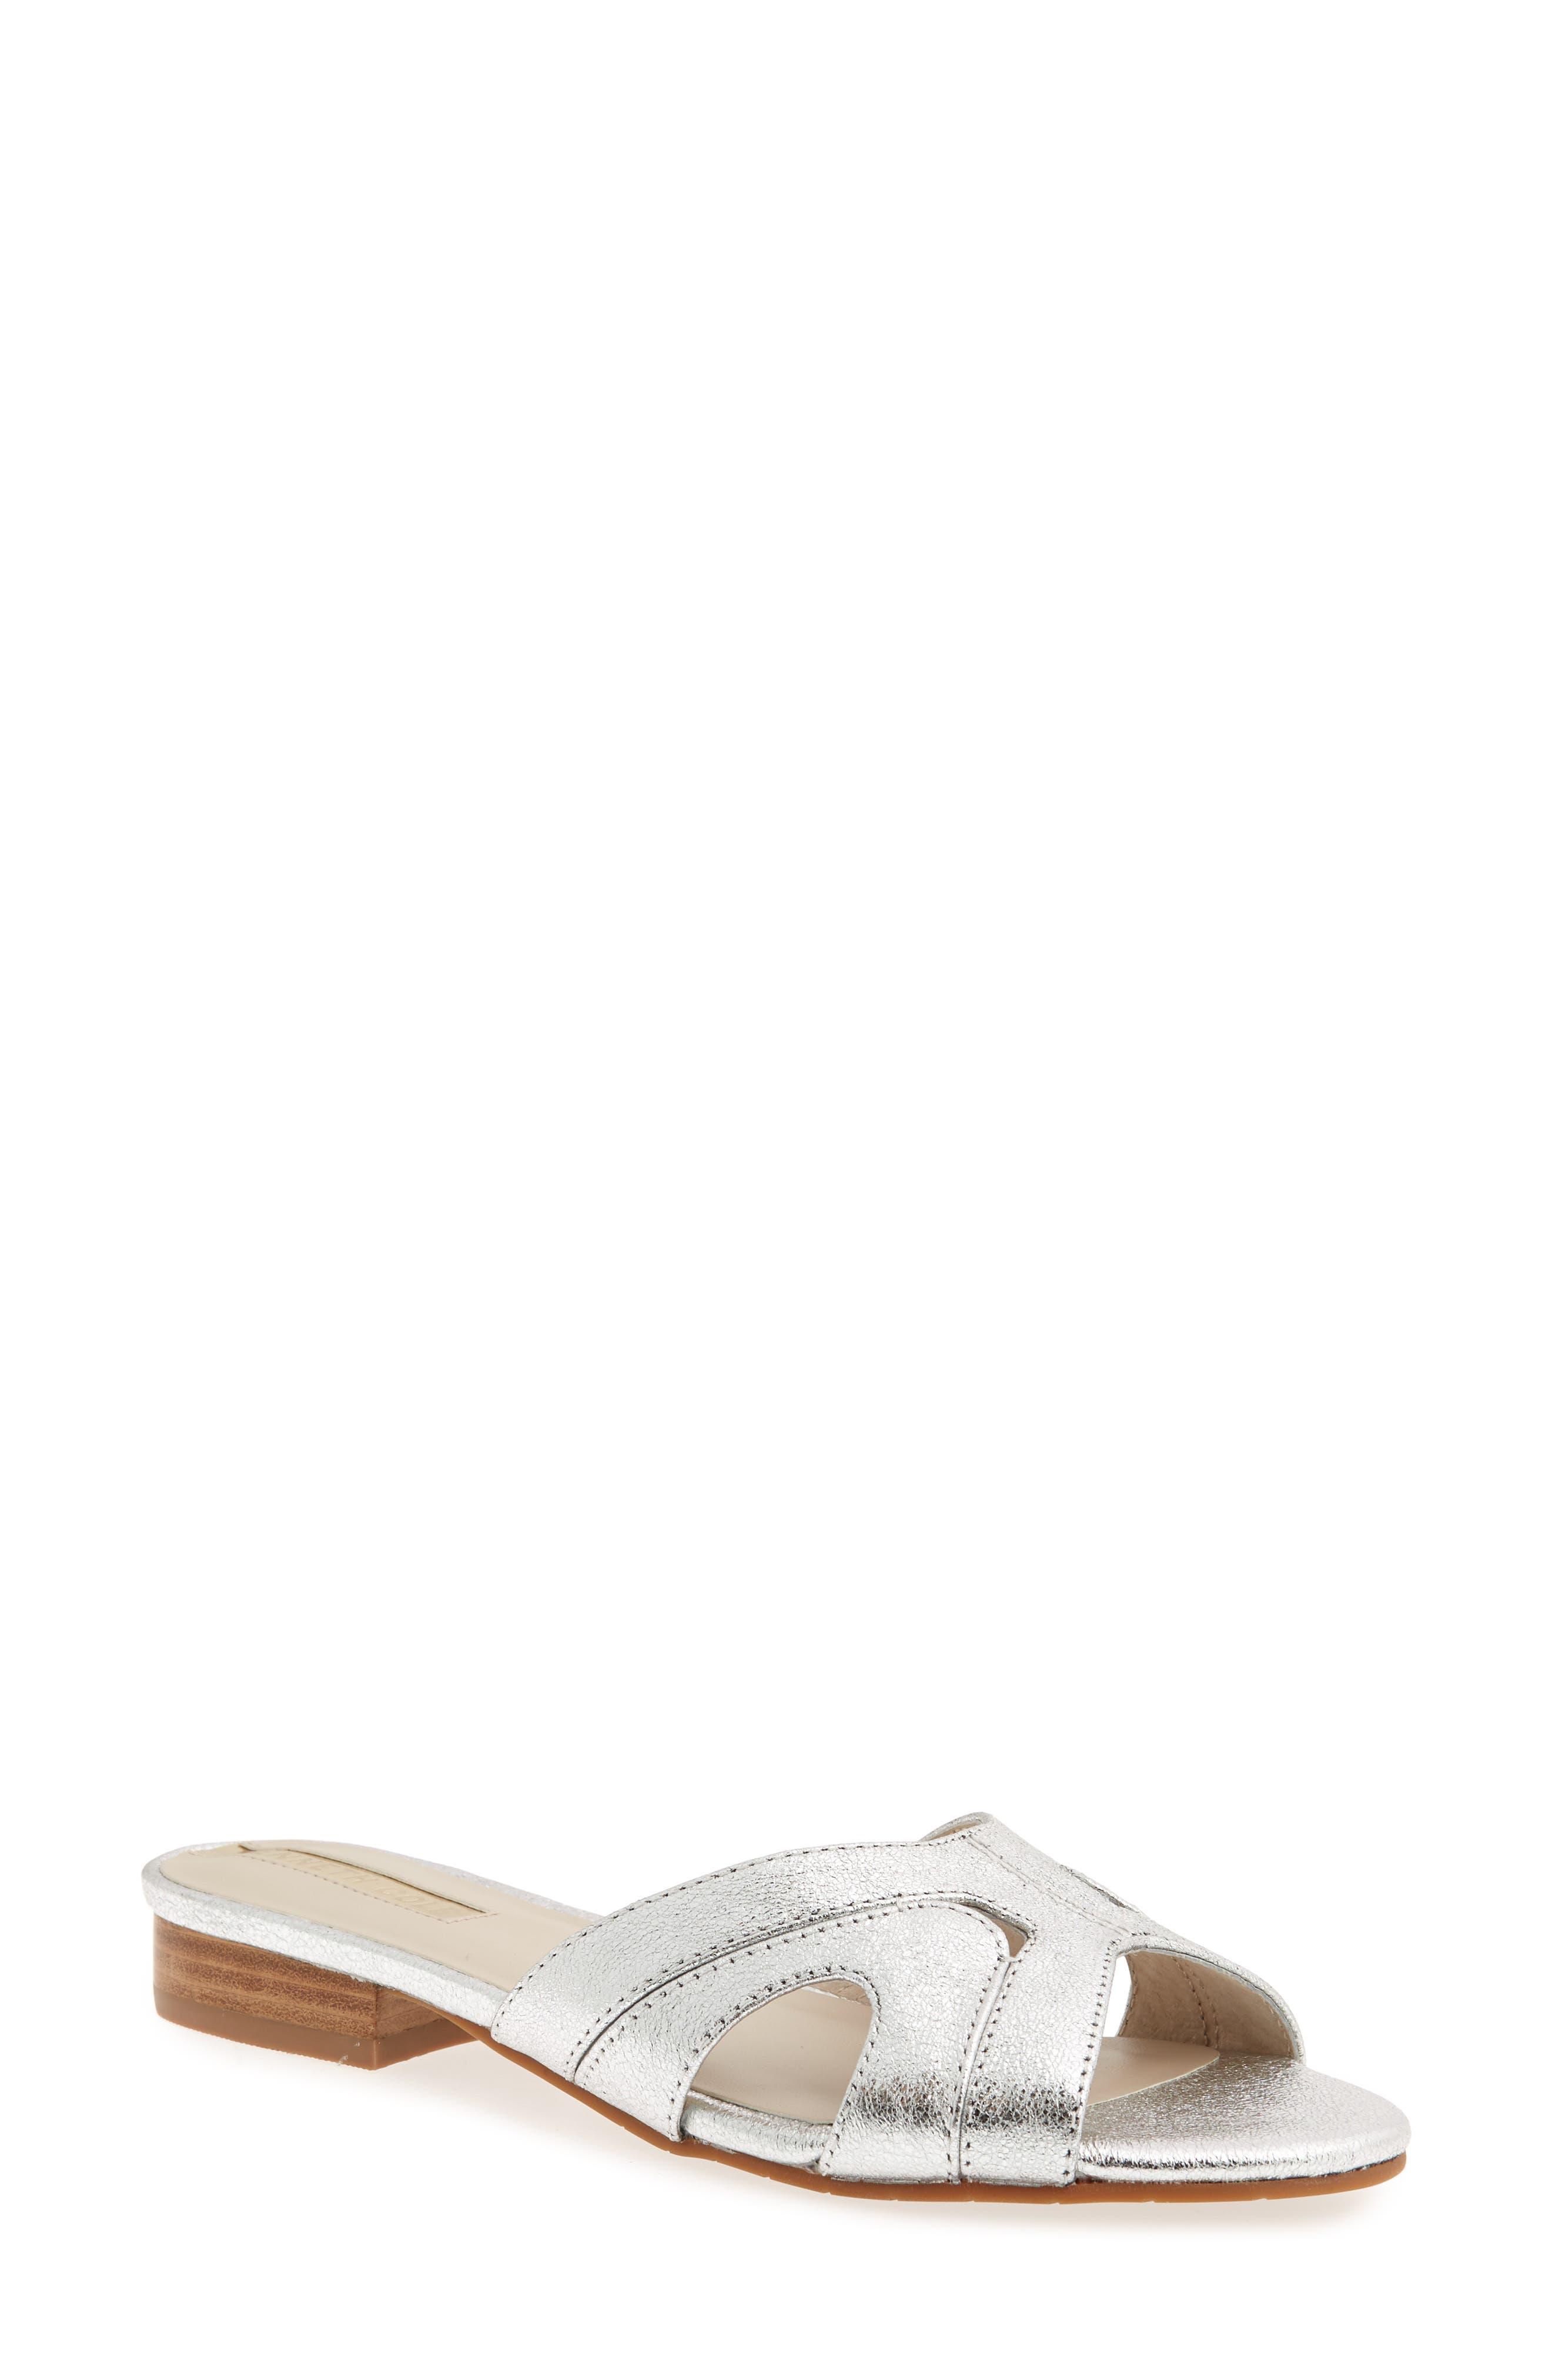 Viveca Slide Sandal,                             Main thumbnail 1, color,                             Silver Leather